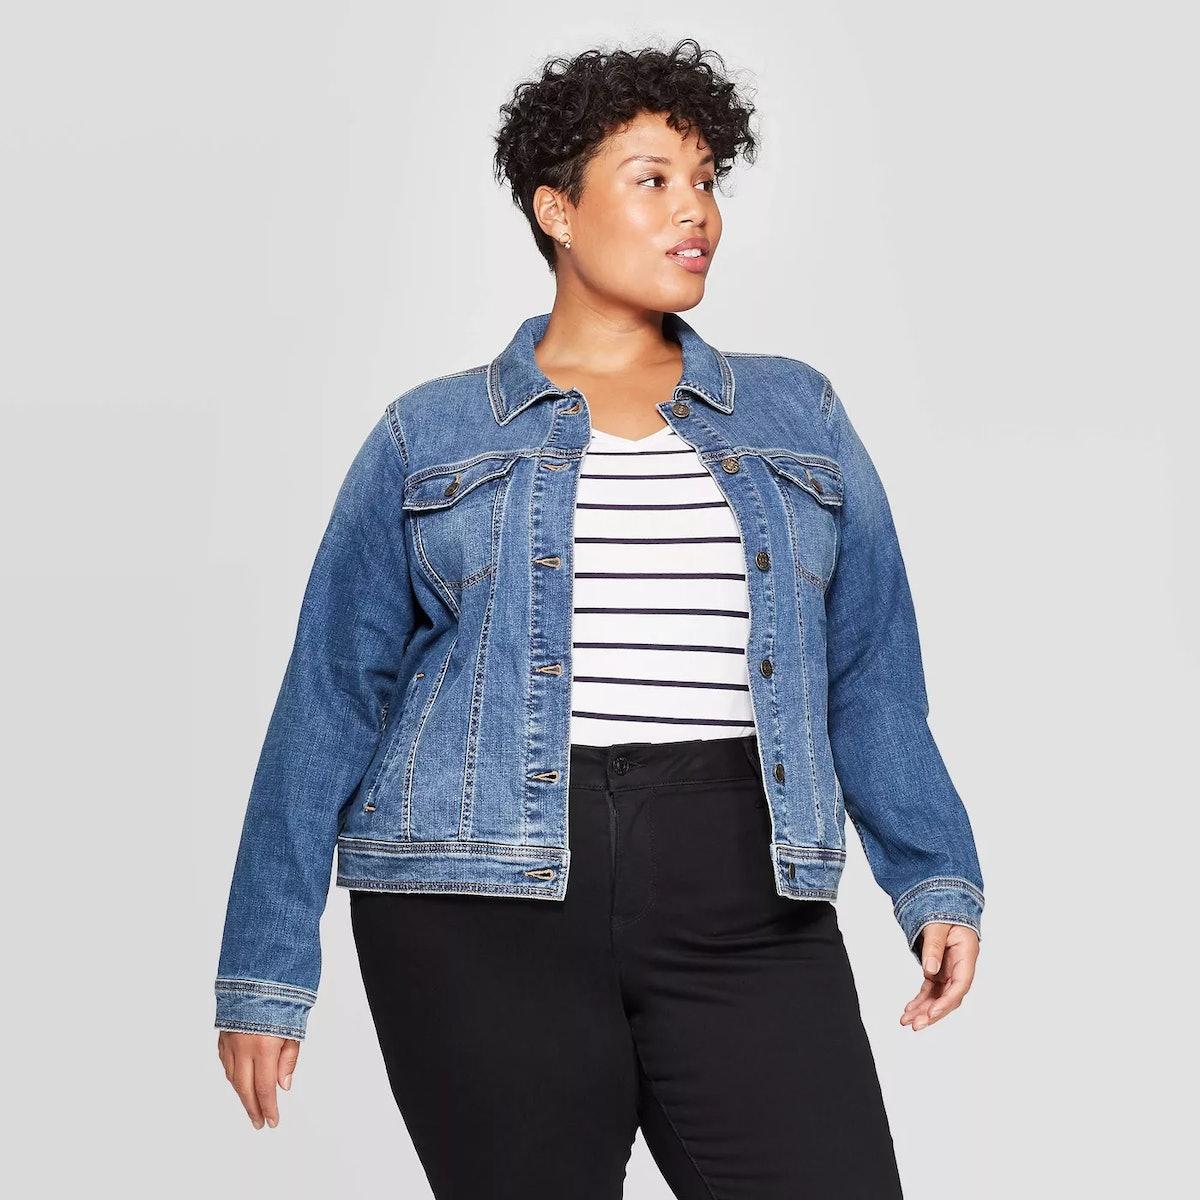 Ava & Viv Women's Plus Size Jean Jacket